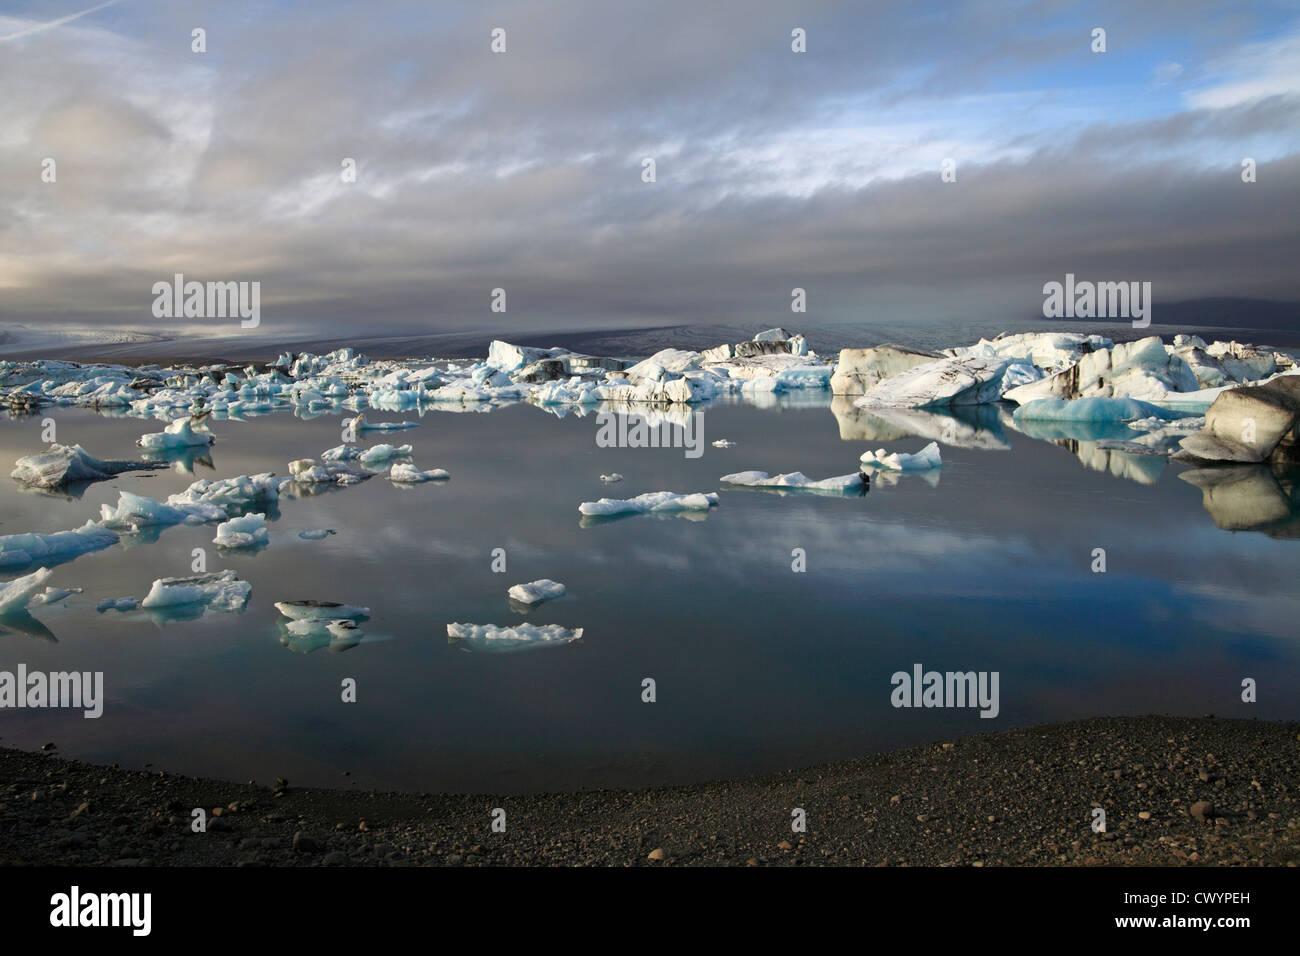 Drift ice in evening light at glacier lake Joekulsarlon, Iceland - Stock Image